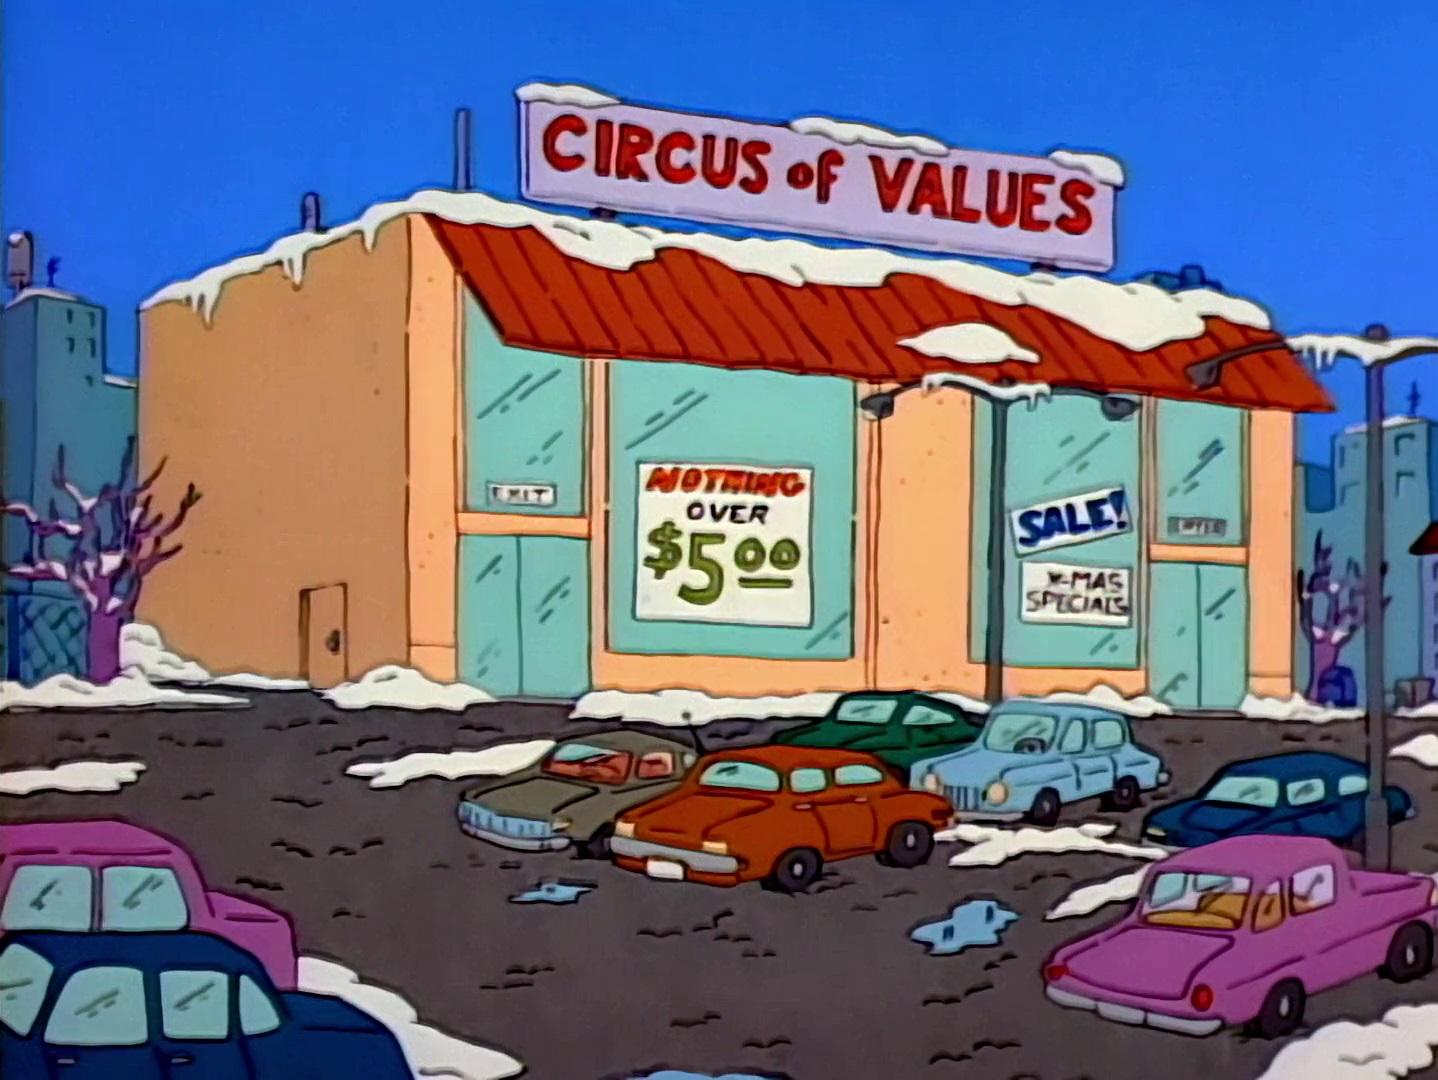 File:Circusofvalues.jpg